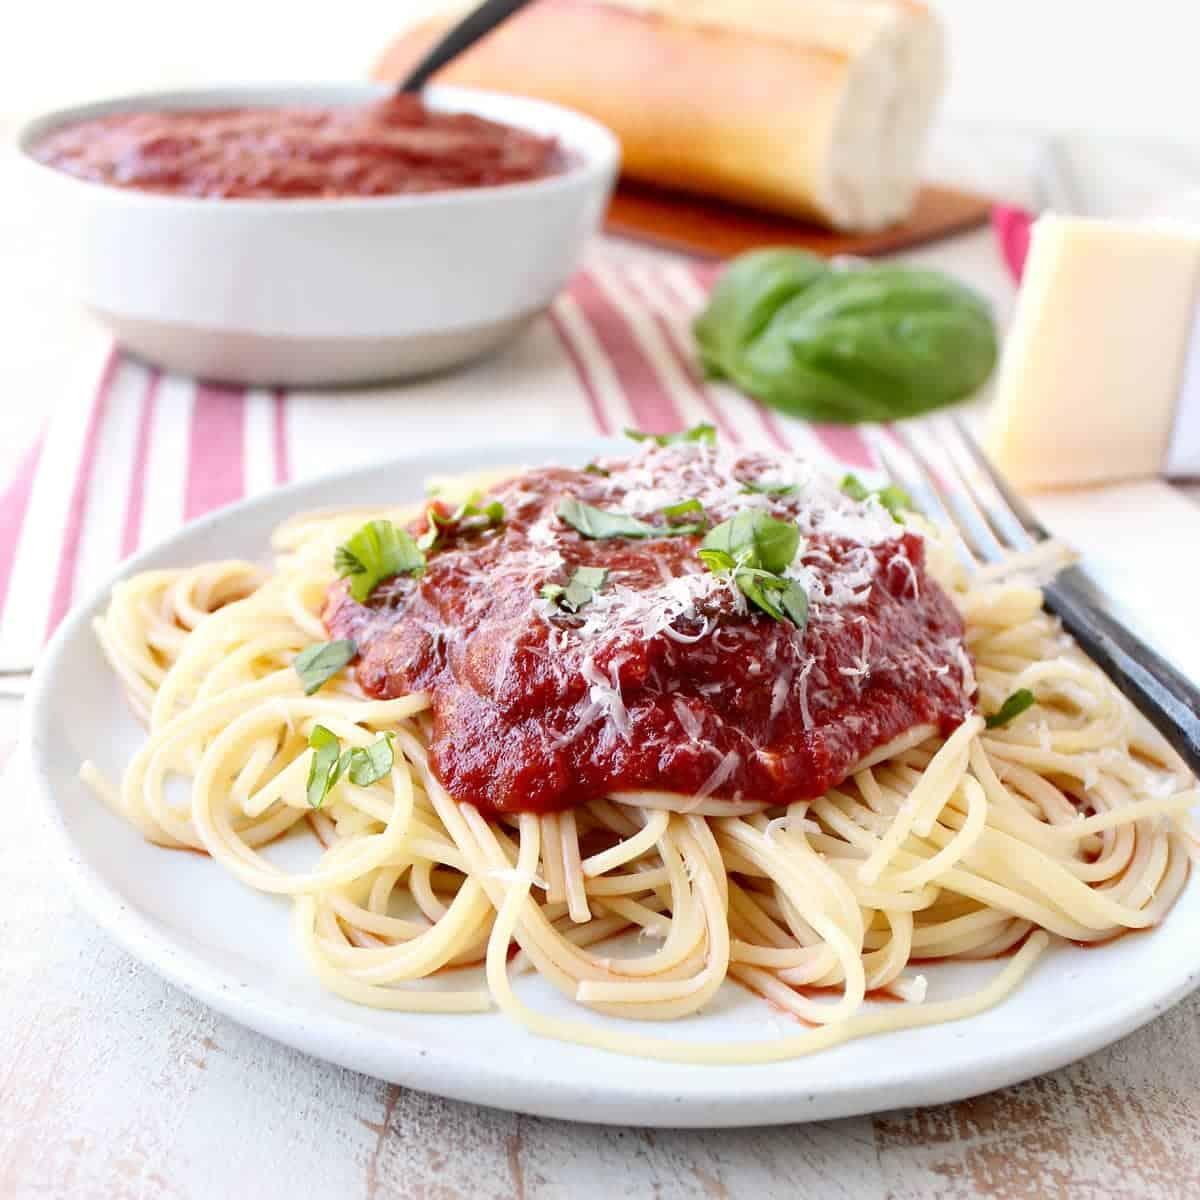 29 Minute Spaghetti Sauce Recipe - WhitneyBond.com